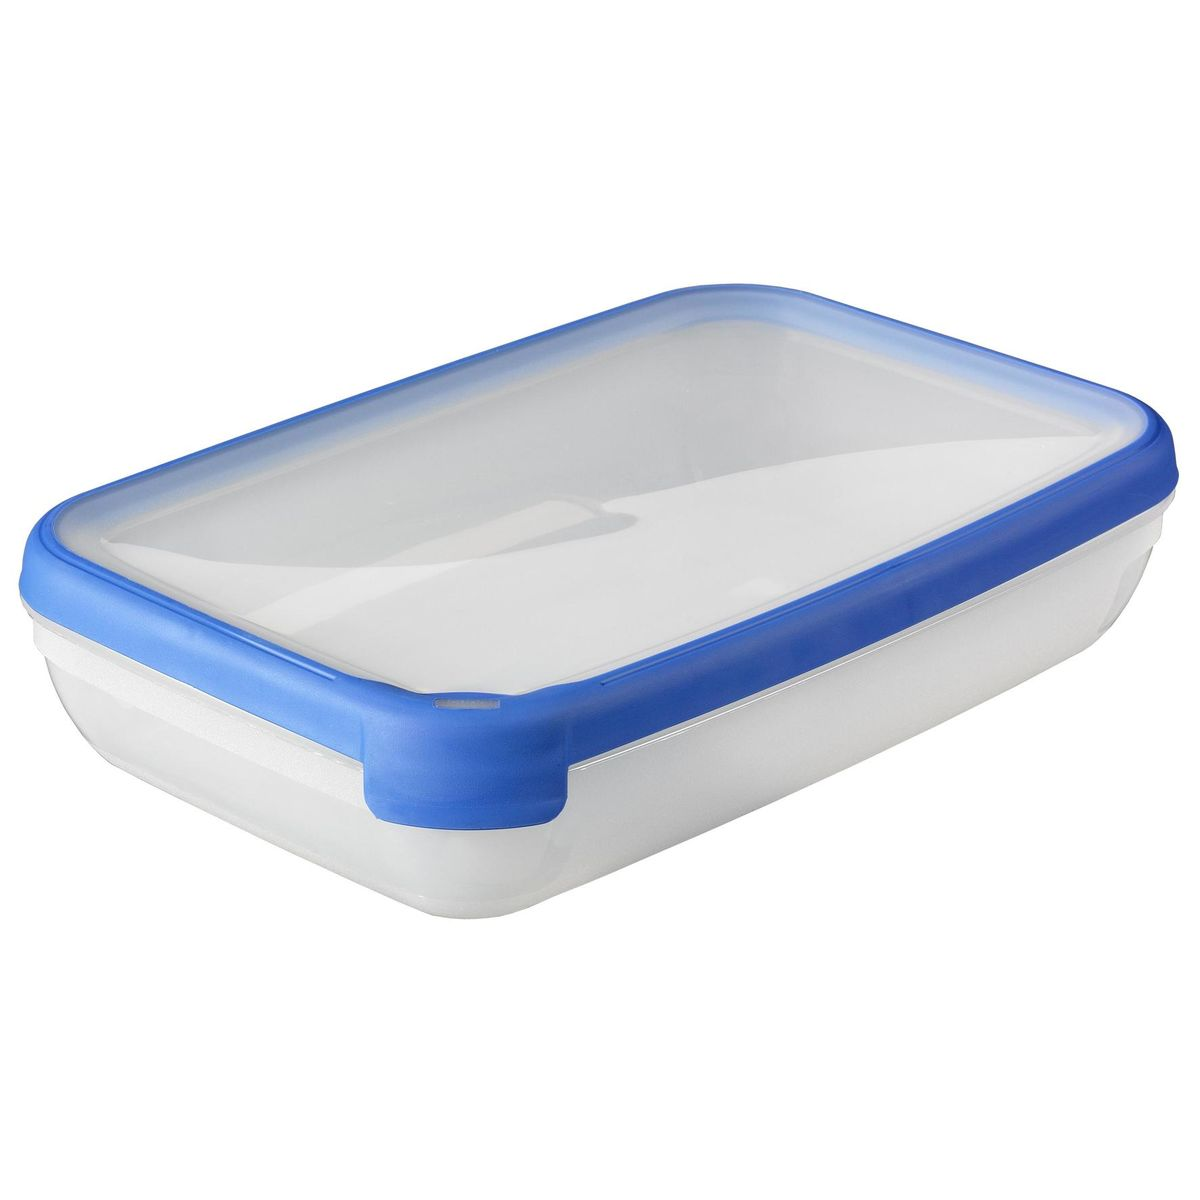 Curver Grand Chef Rechthoekige vershouddoos 2,6L - Transparant / Blauw